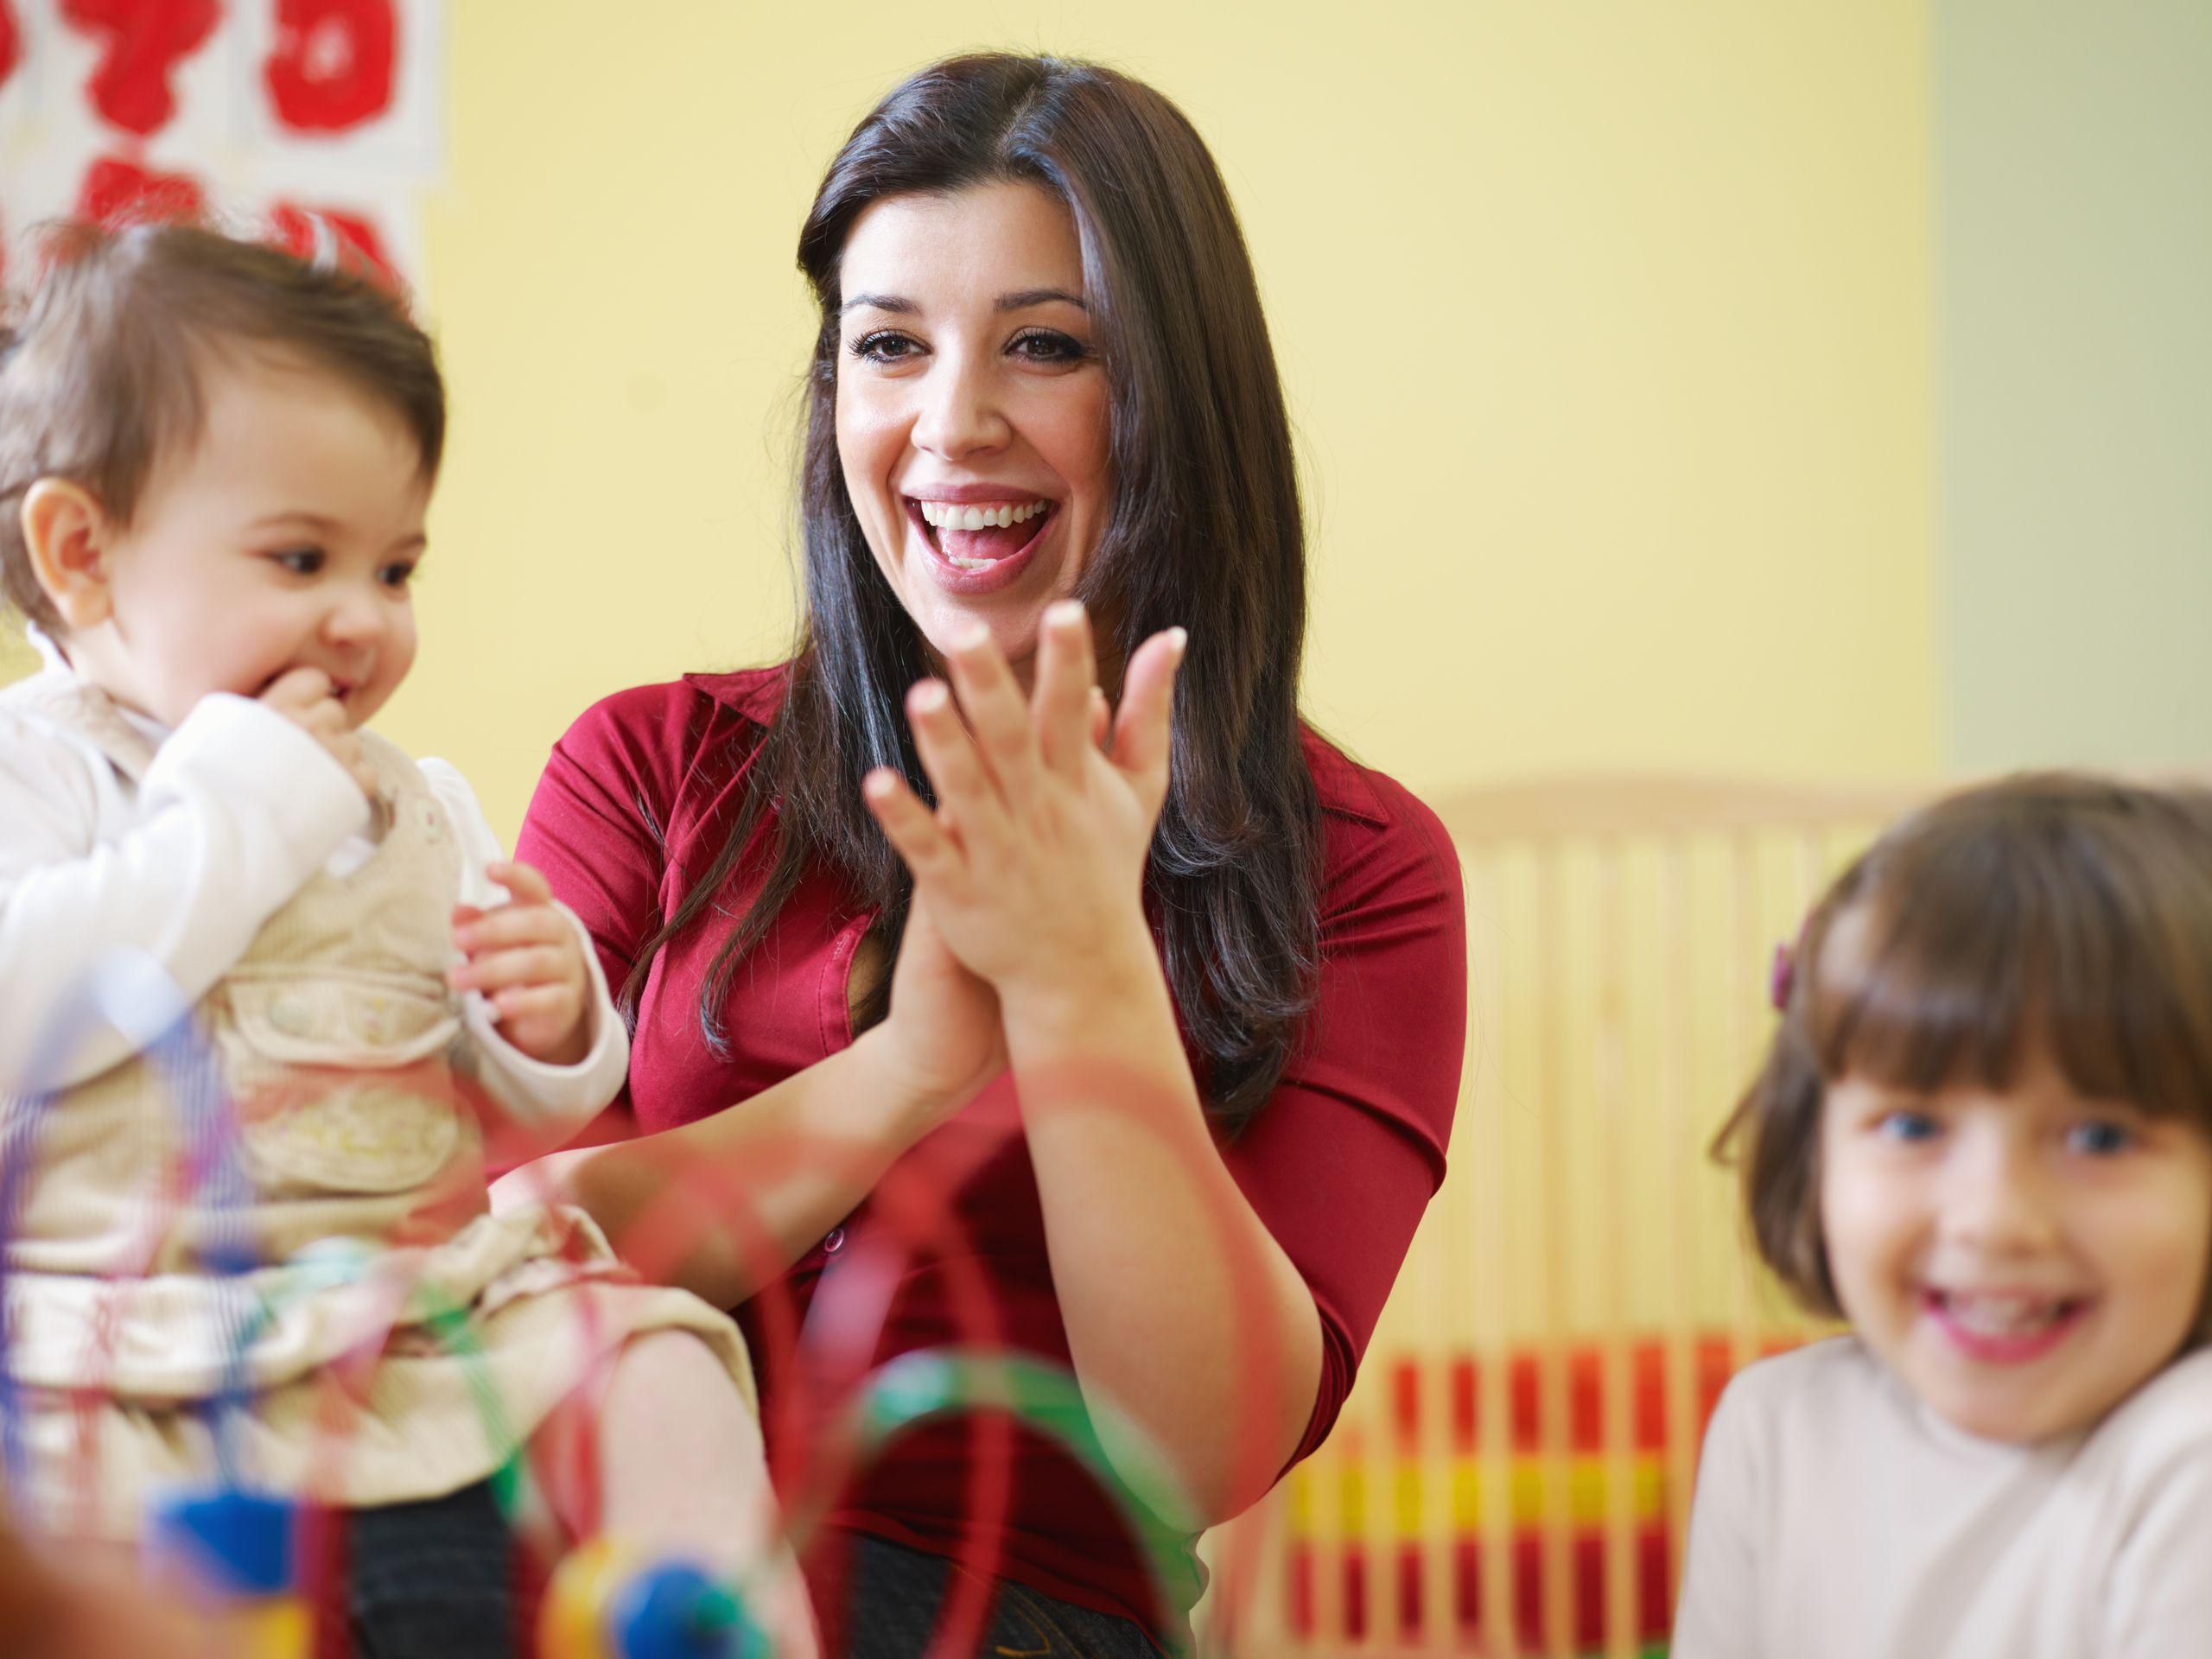 Praising children teaches children to look for approval